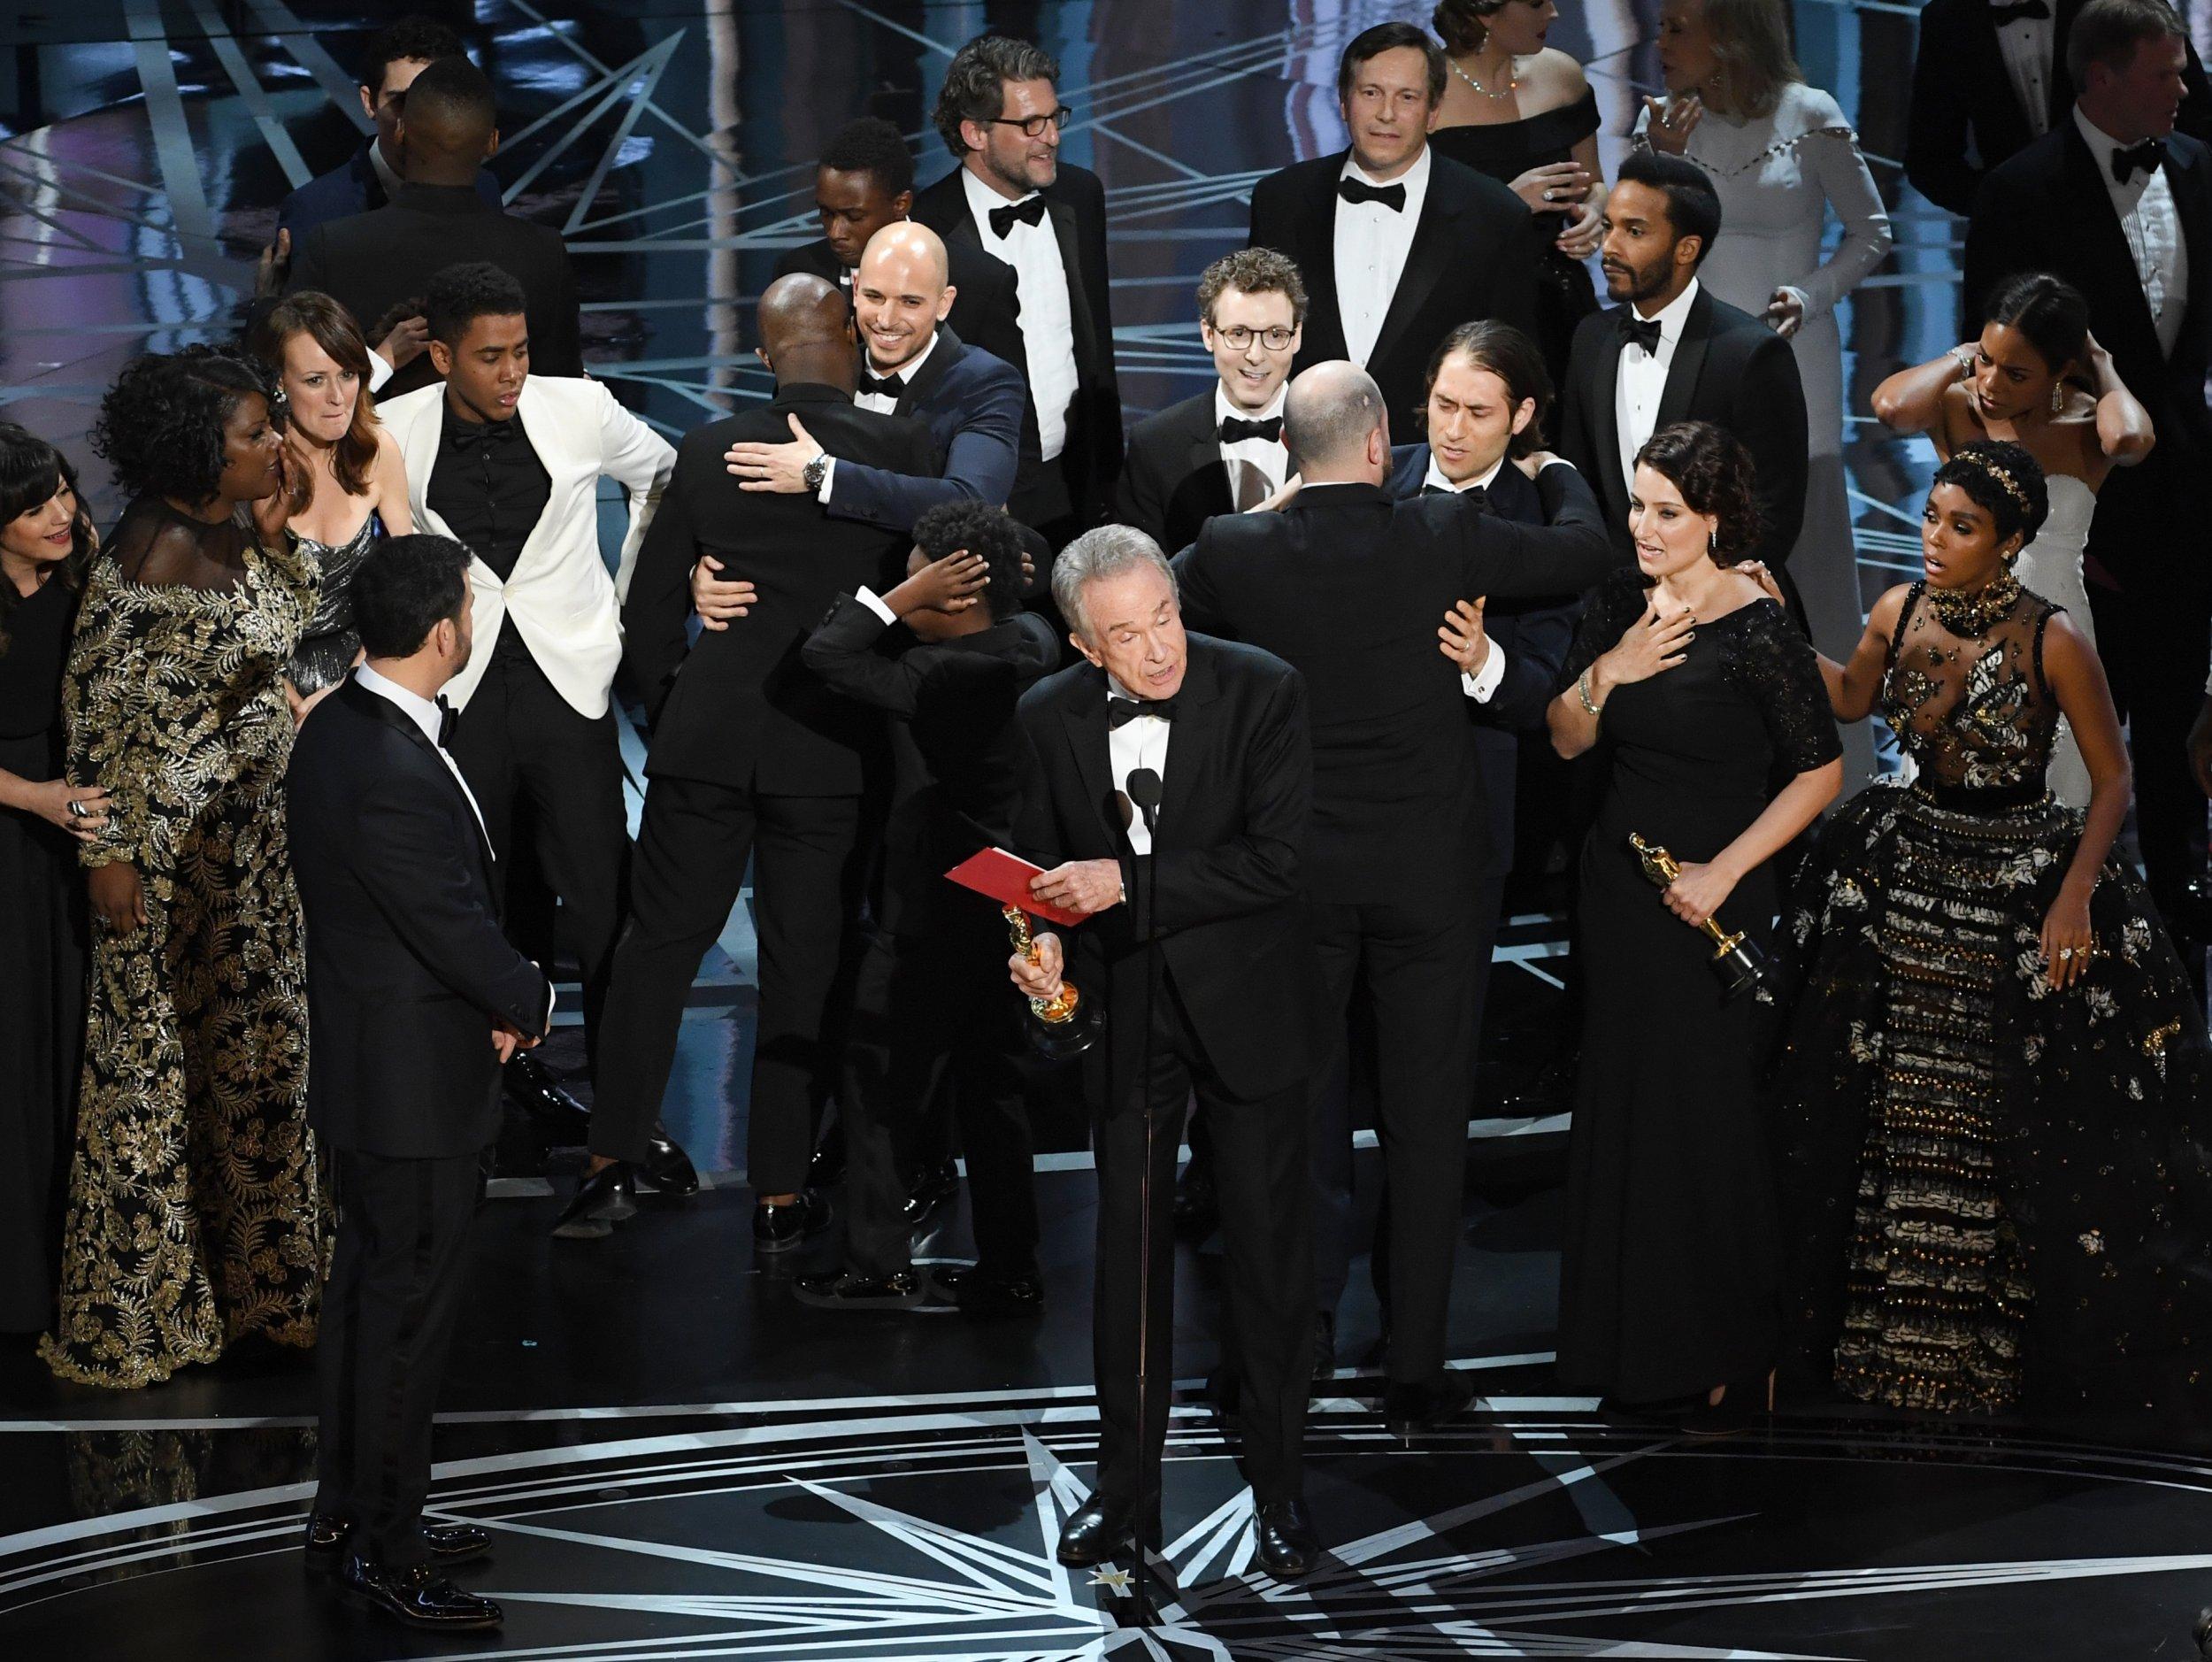 Oscars - Warren Beatty announces wrong best picture